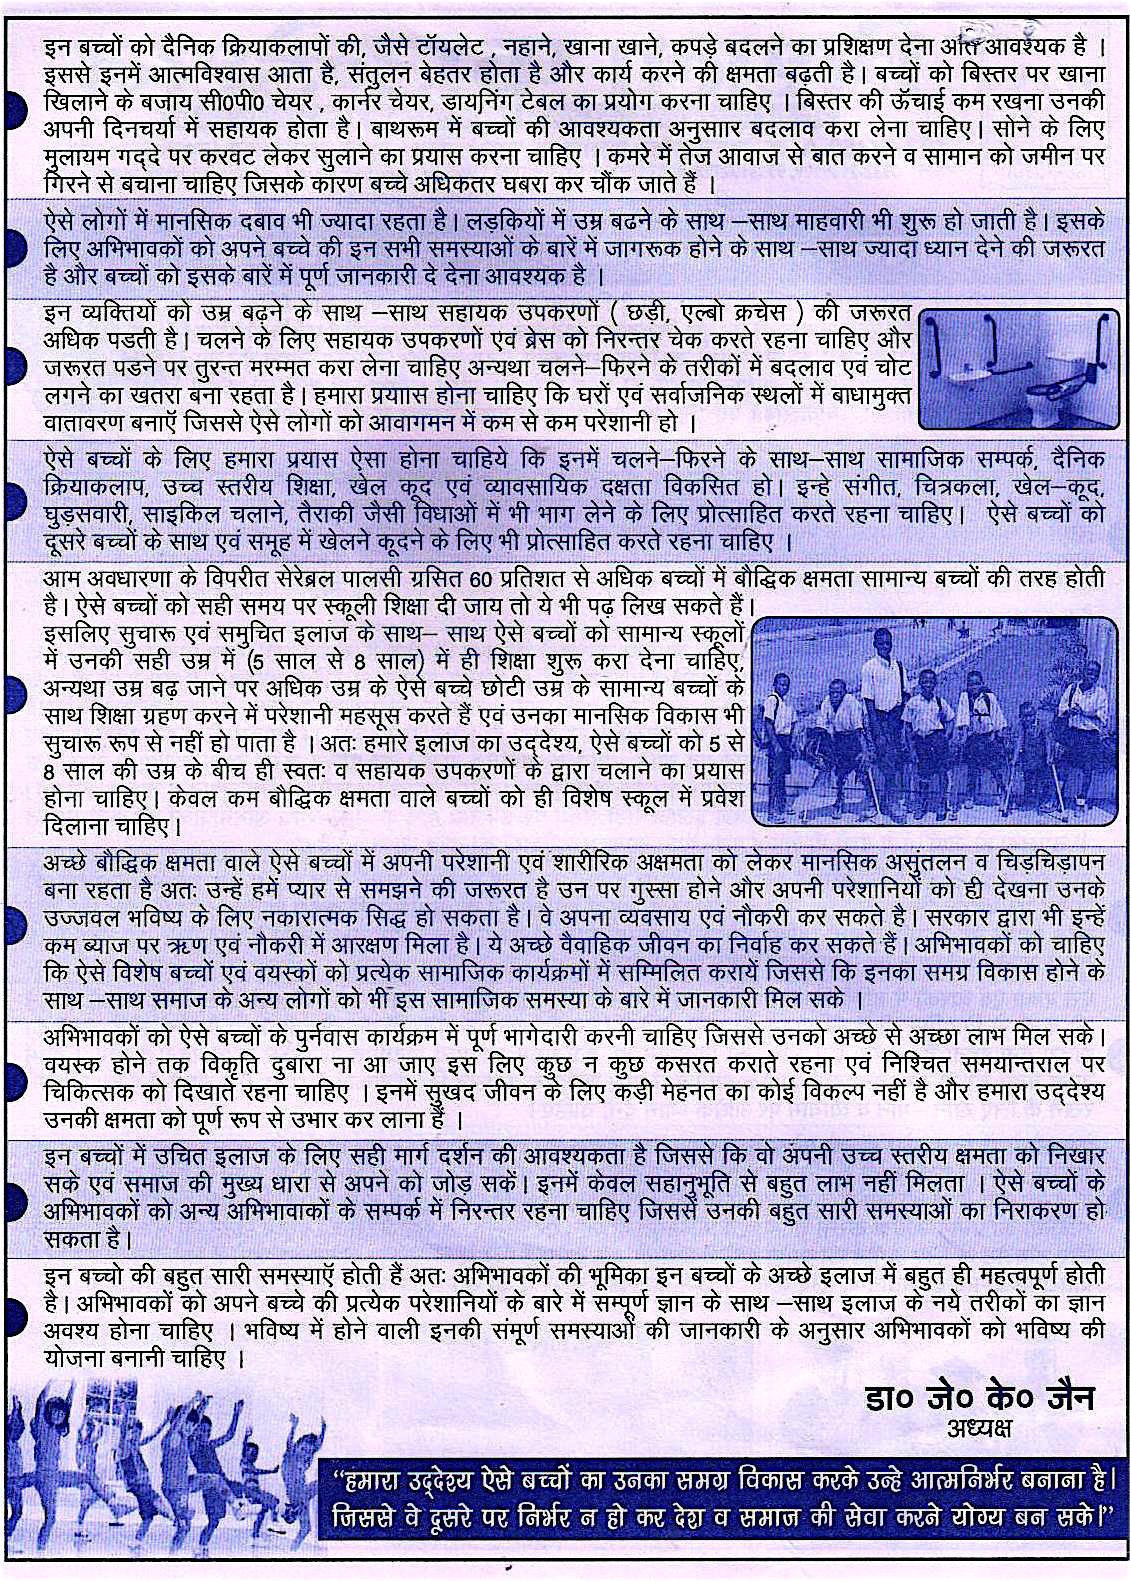 important instructions Twenty important spiritual instructions a series of talks on gurudev's twenty important spiritual instructions by sri swami chidananda sri swami sivananda.